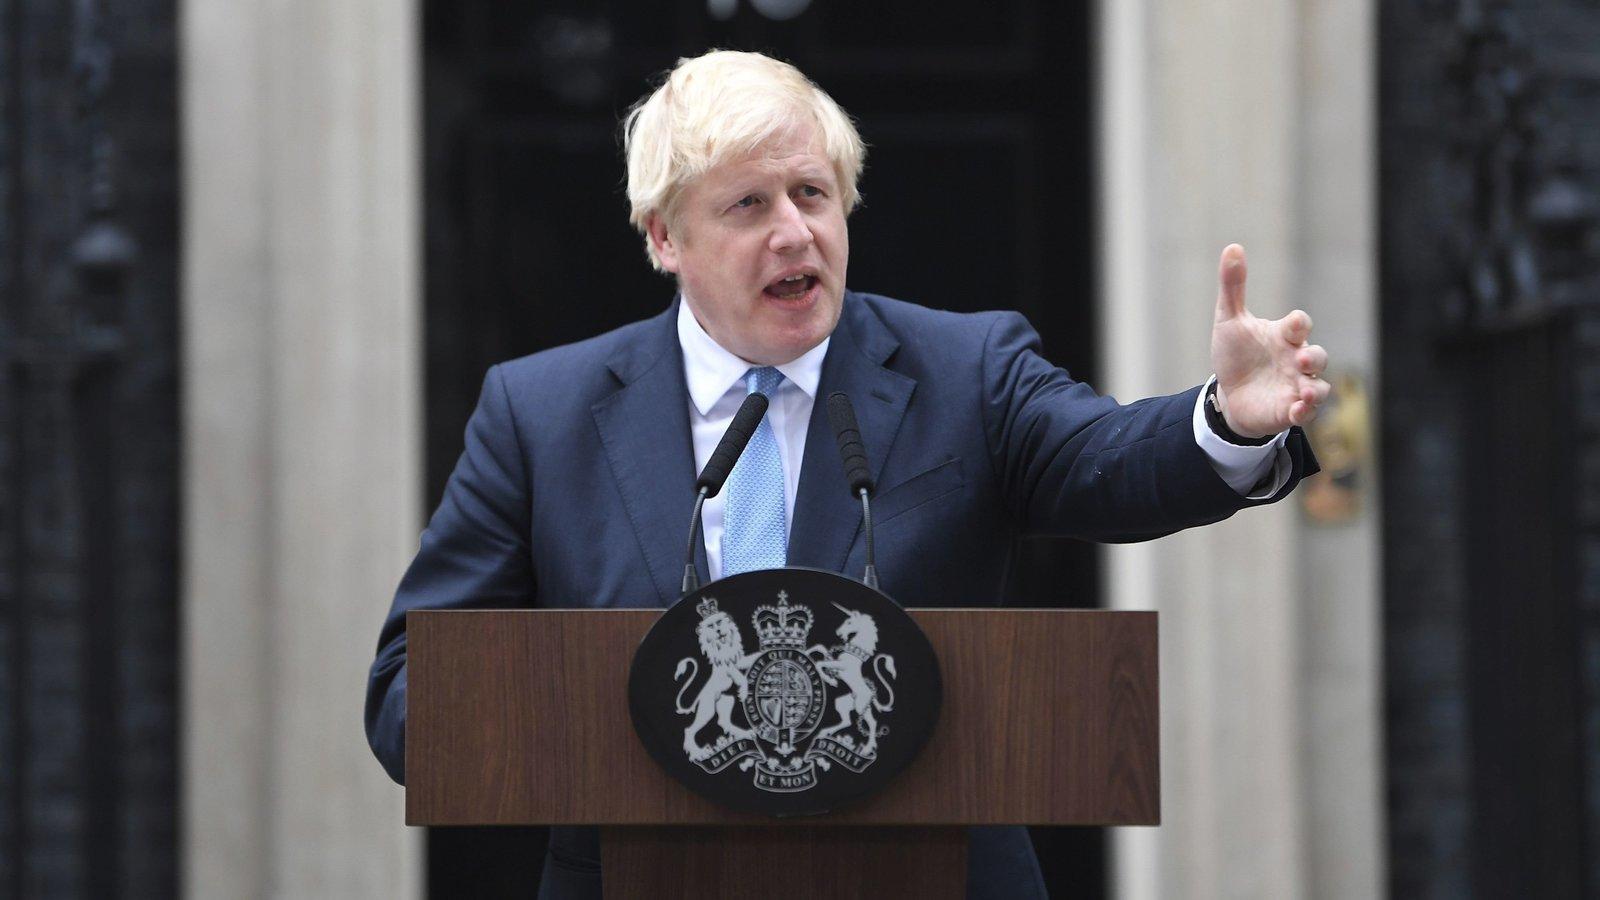 Petition Boris Johnson Apologise For Comparing Muslim